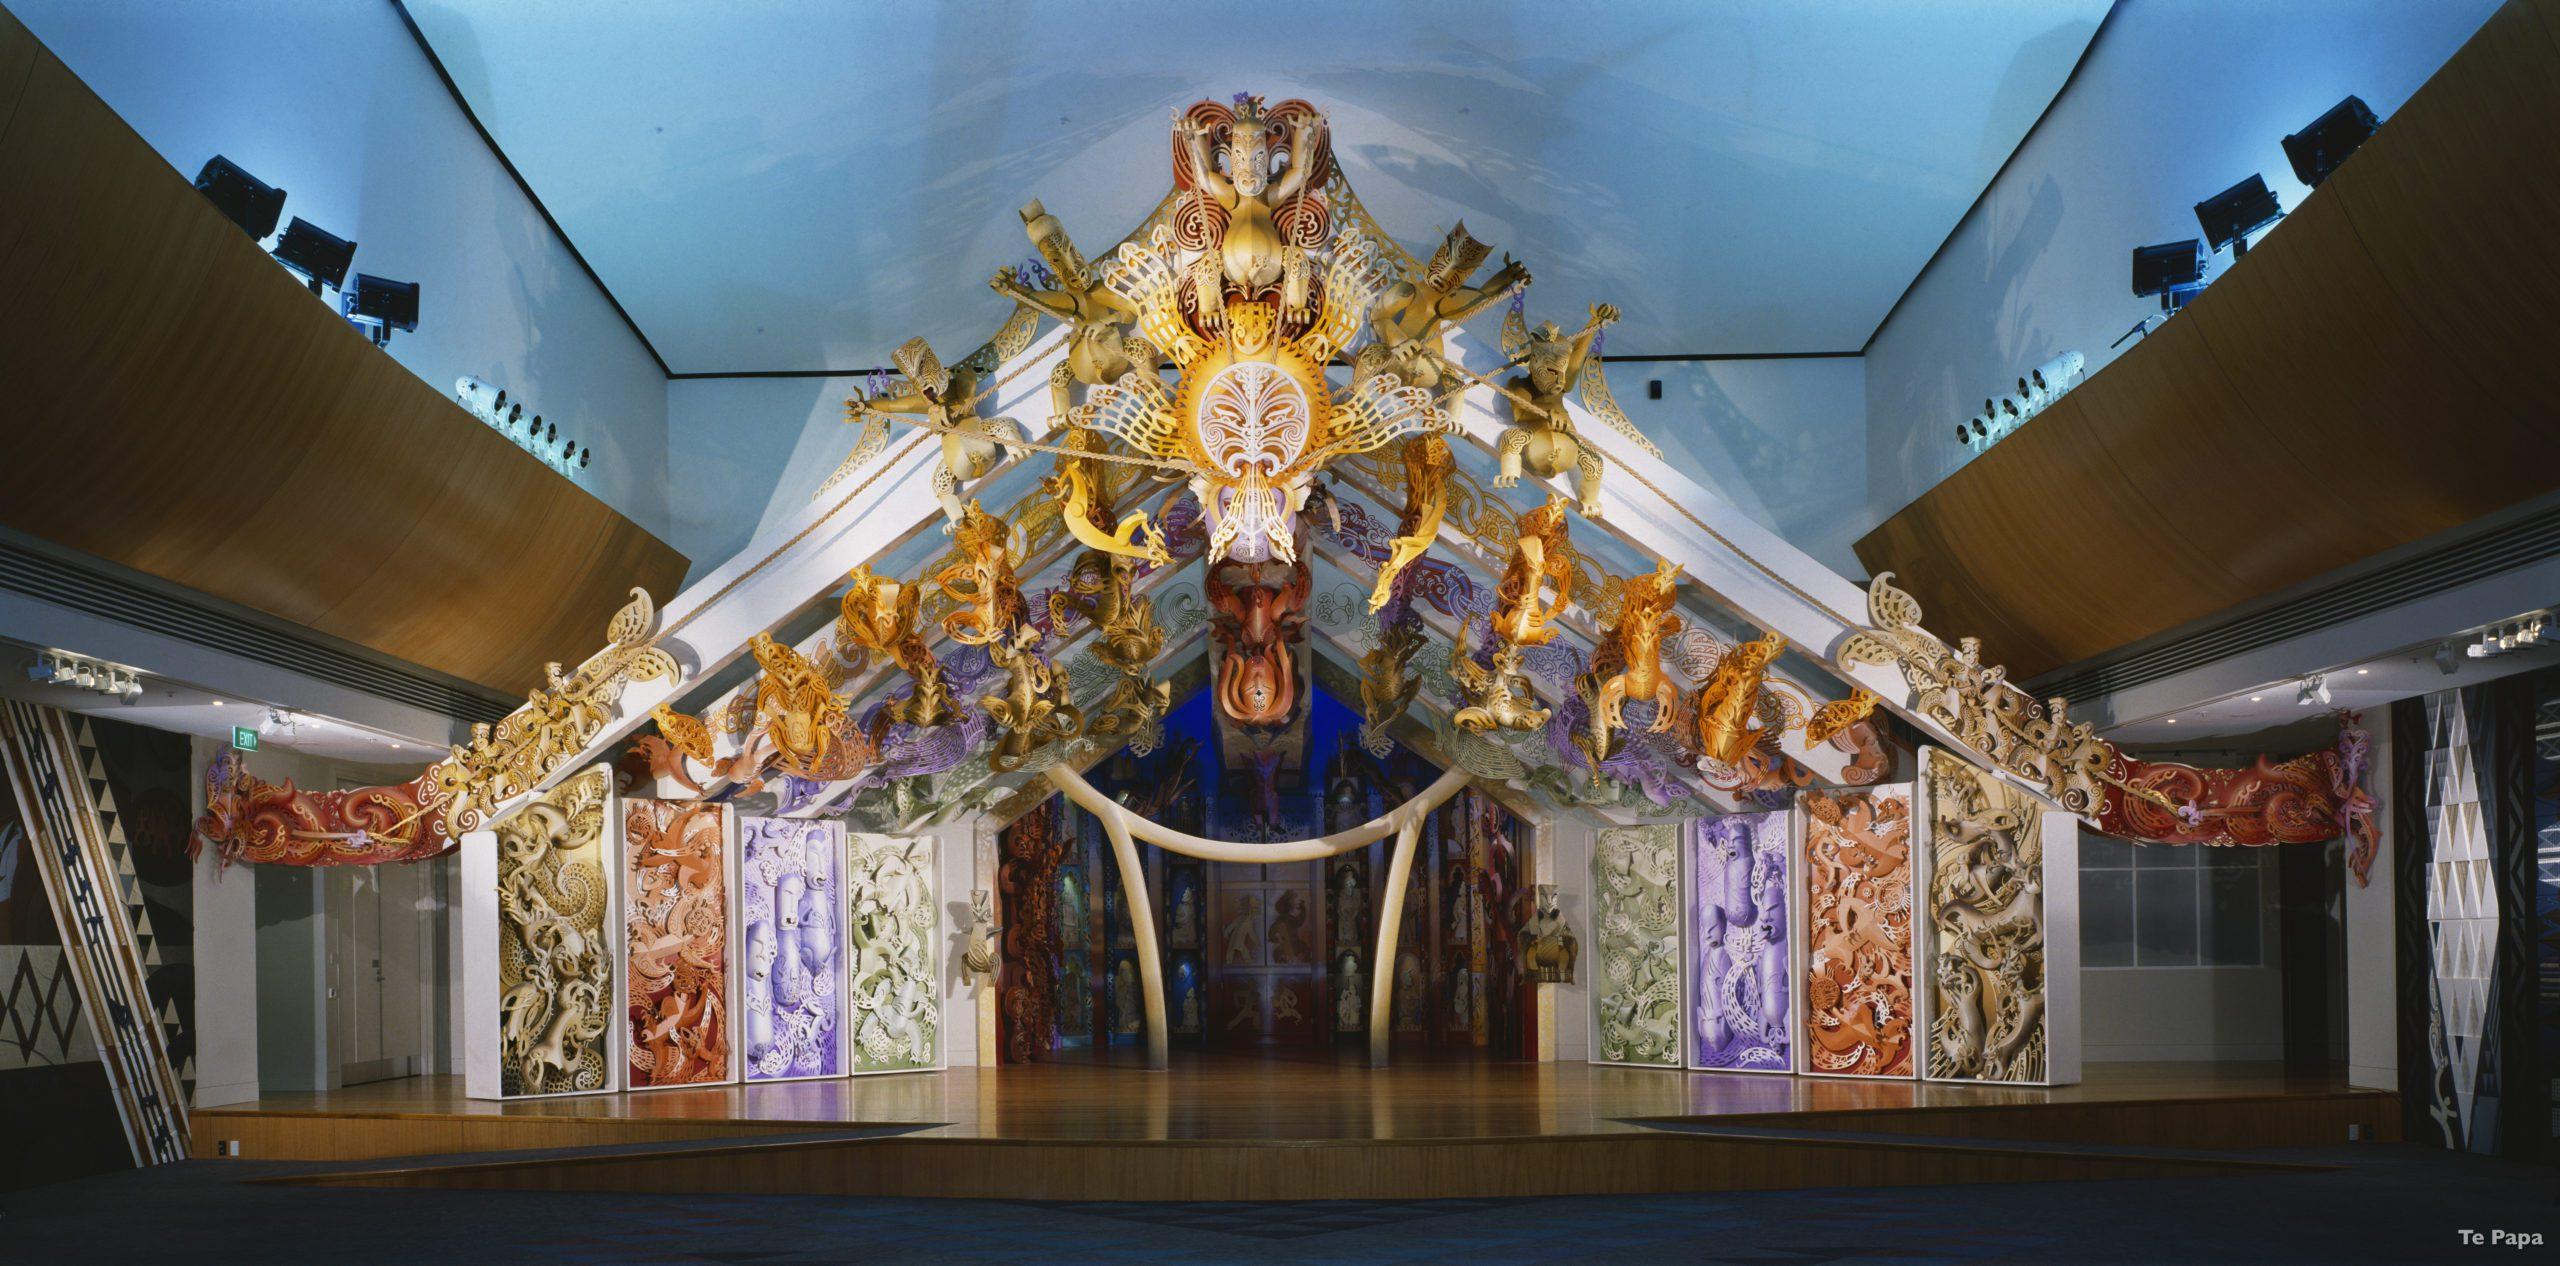 An ornate Marae inside the Te Papa Museum in Wellington